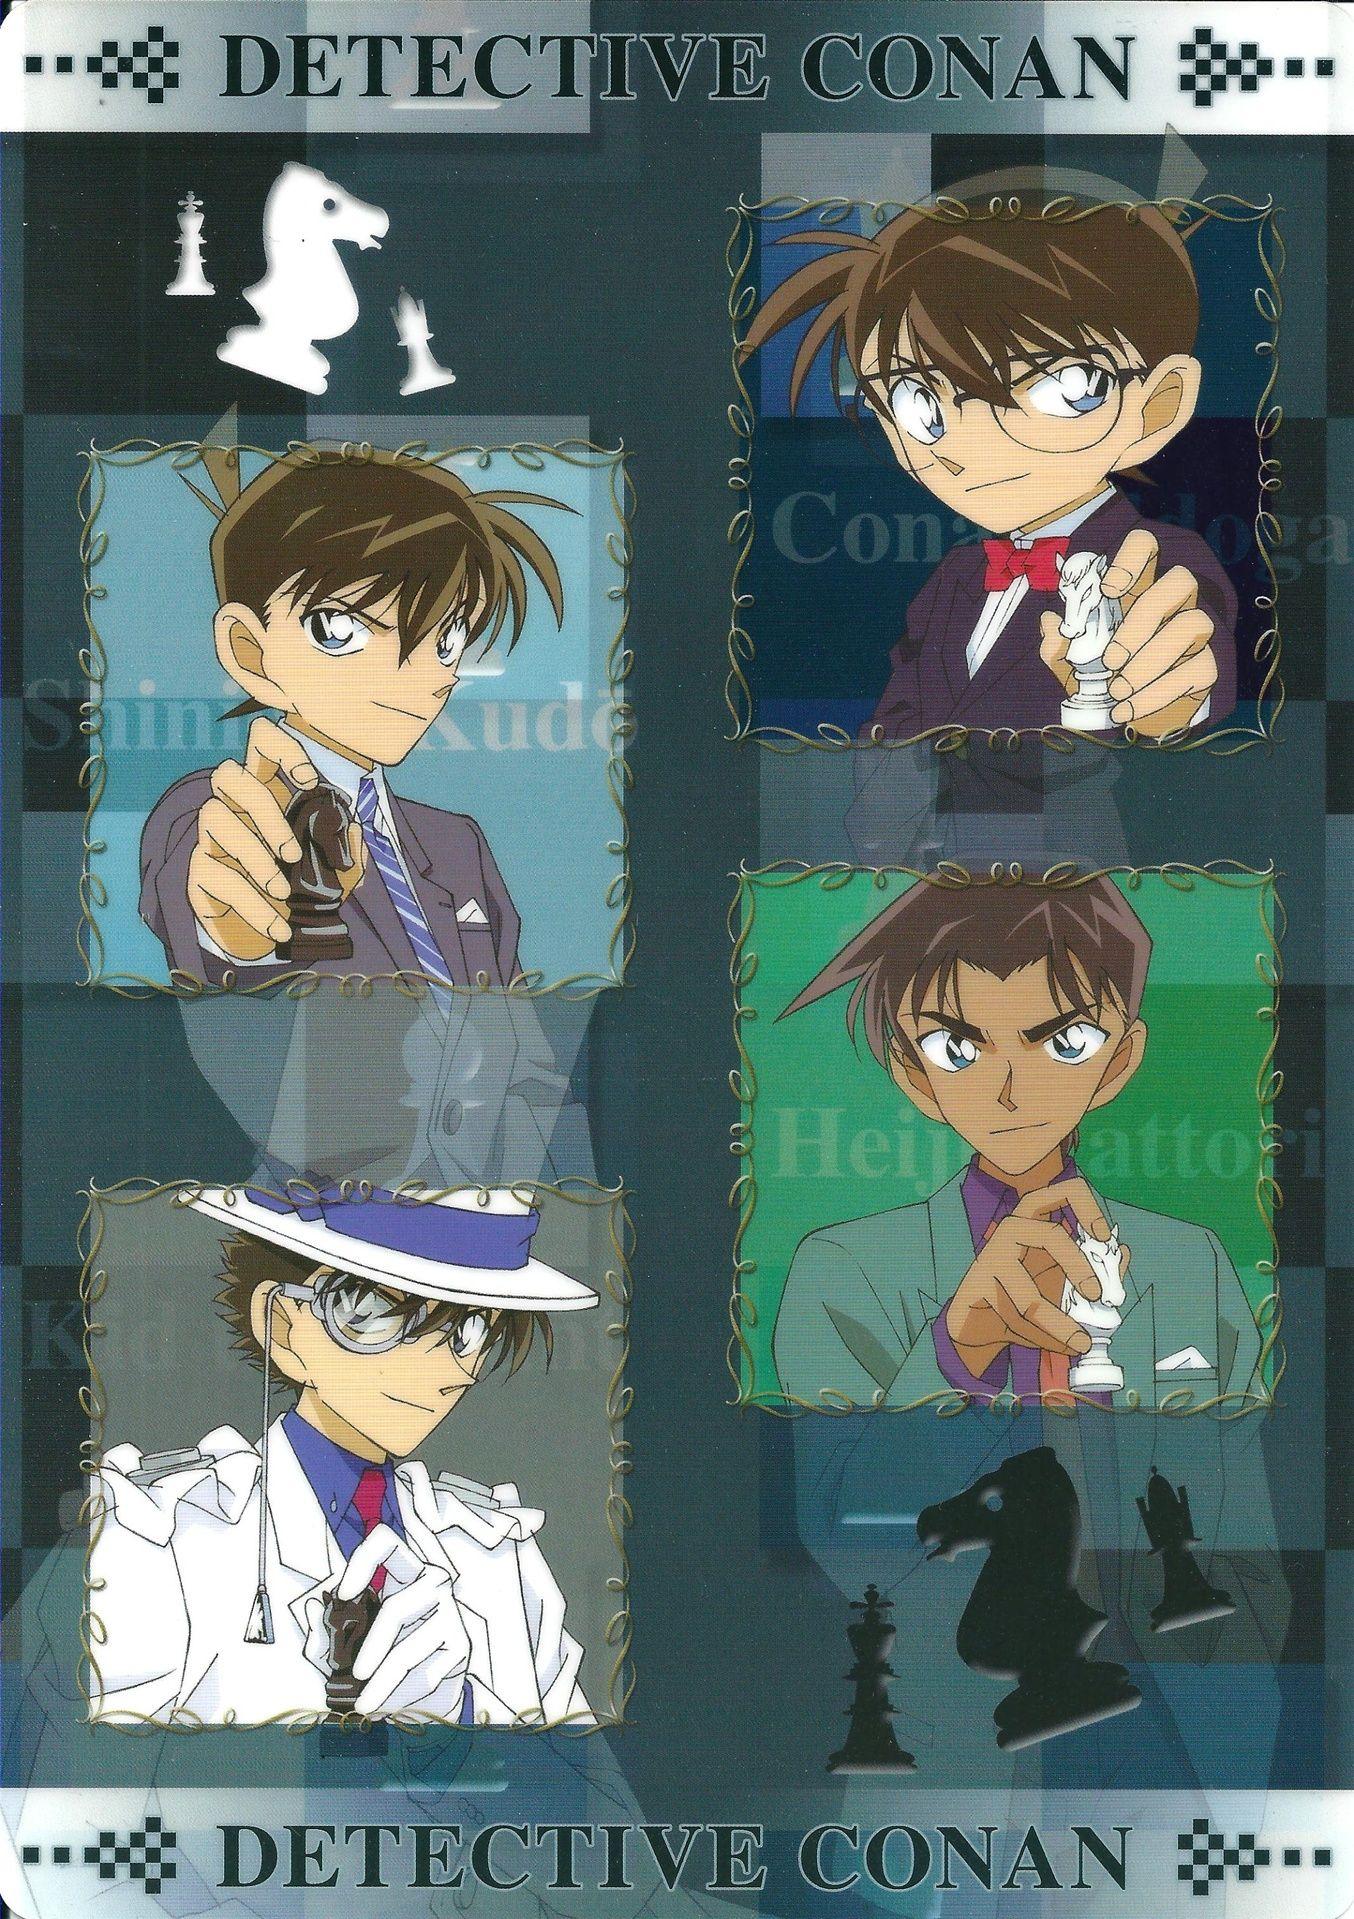 Cute Inuyasha Wallpaper Detective Conan Detective Conan Conan Detektif Conan